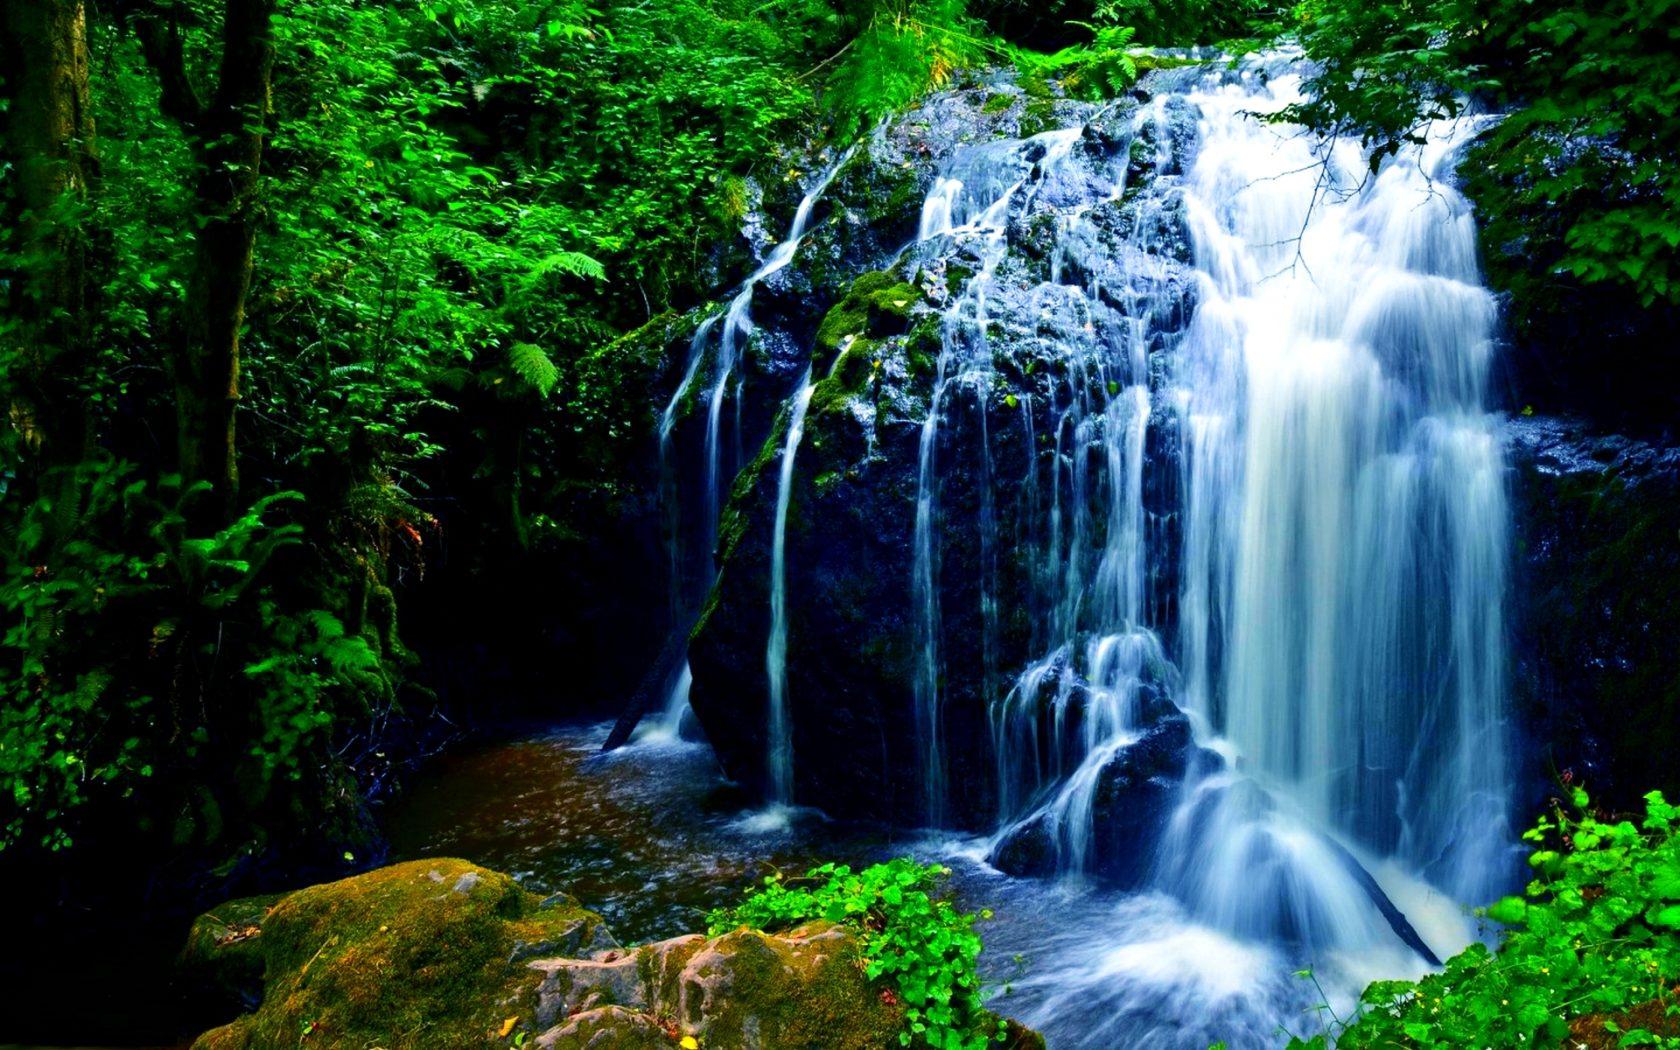 Fall Wallpaper And Screensavers For Free Nature Beautiful Waterfall Green Noise Rock Fern Green